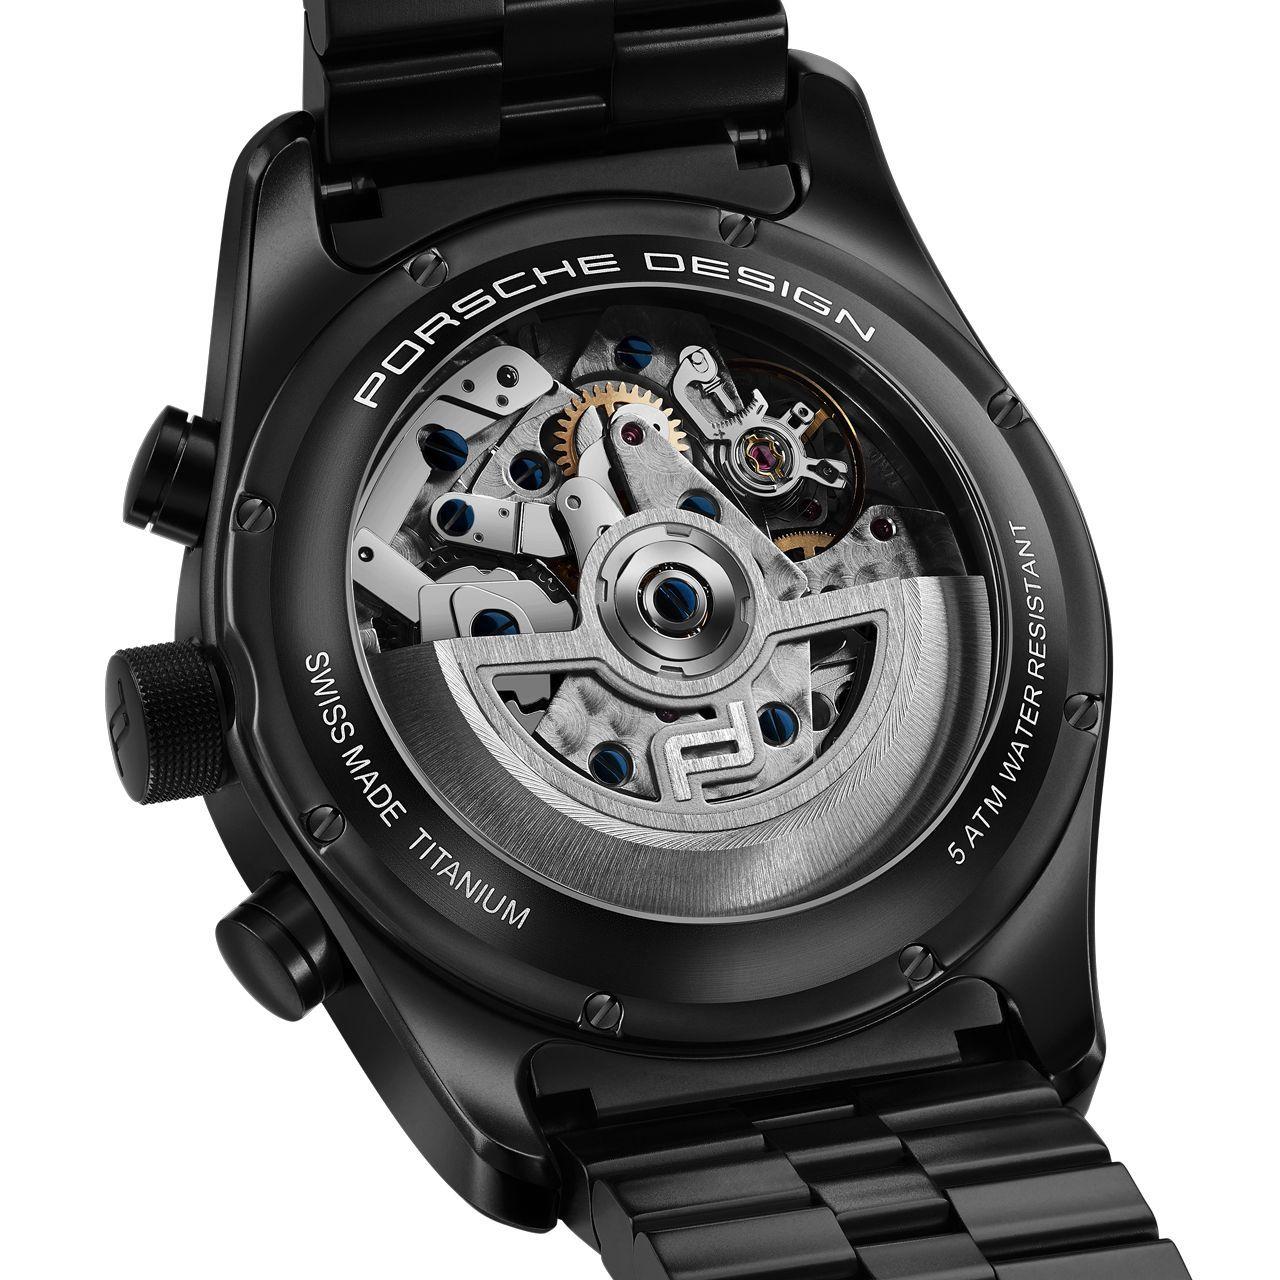 Montre Porsche Design Chronotimer Series 1 Matte Black vue 2